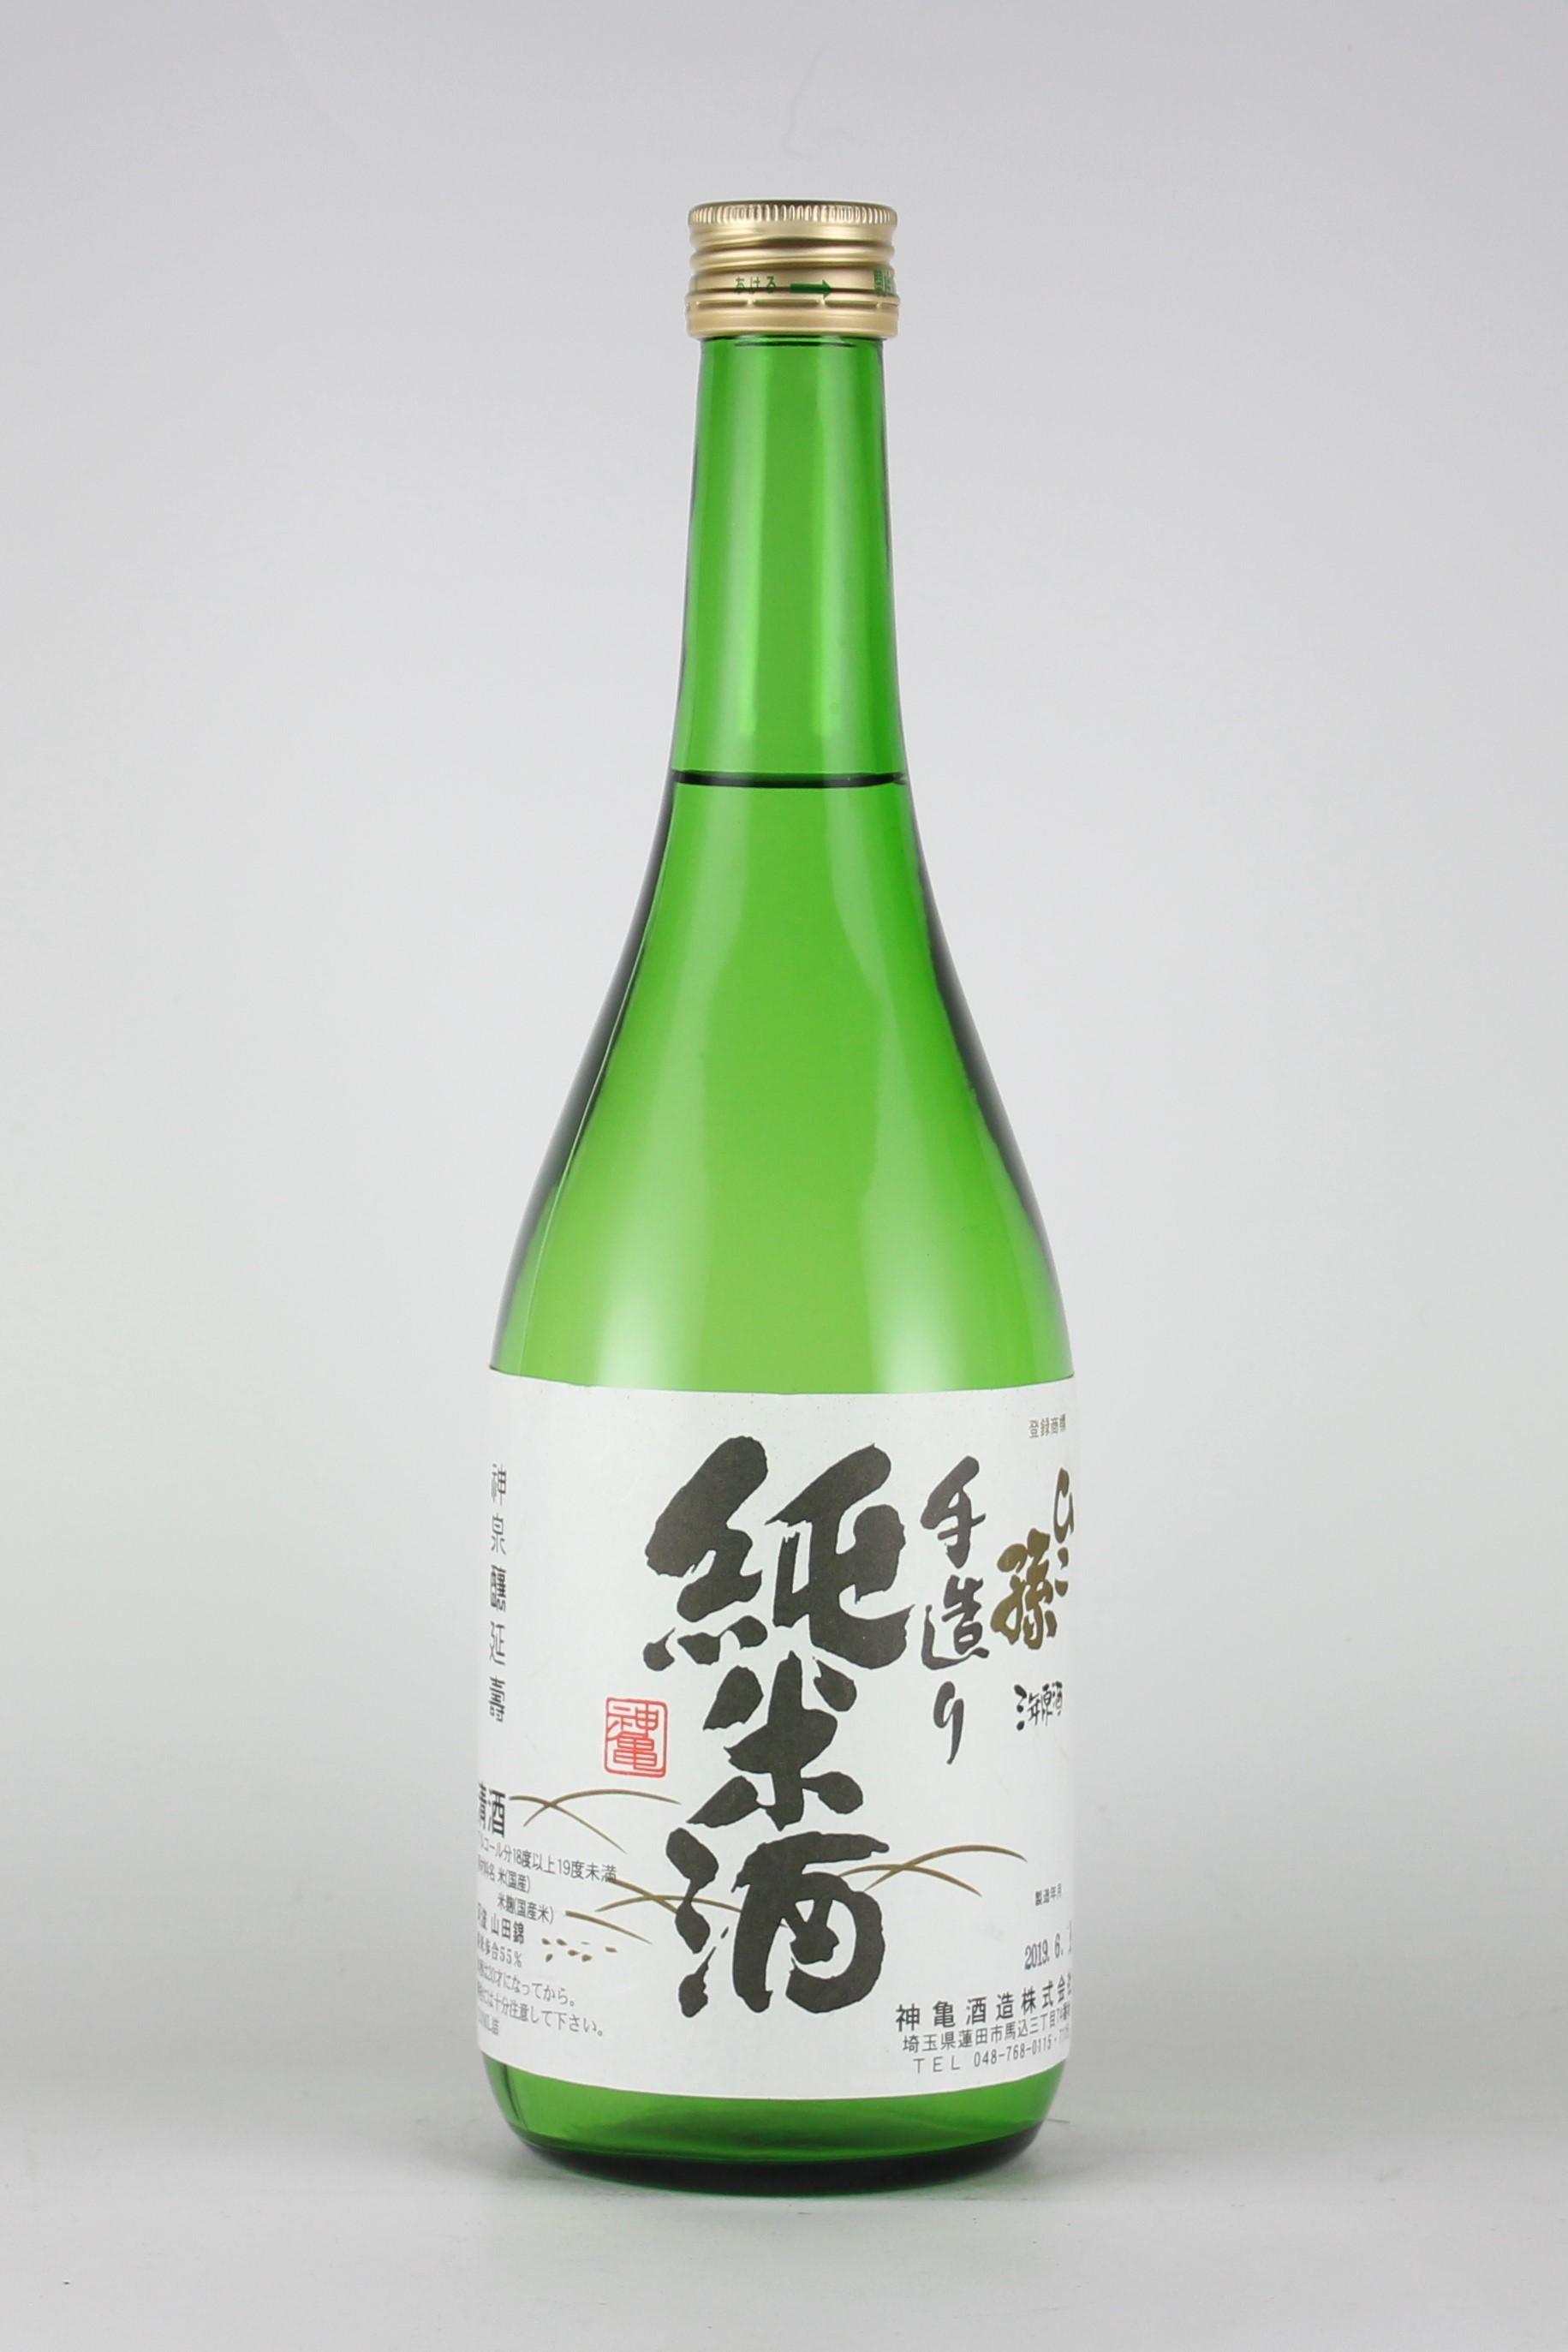 ひこ孫 2013醸造年度 純米原酒 720ml 【埼玉/神亀酒造】